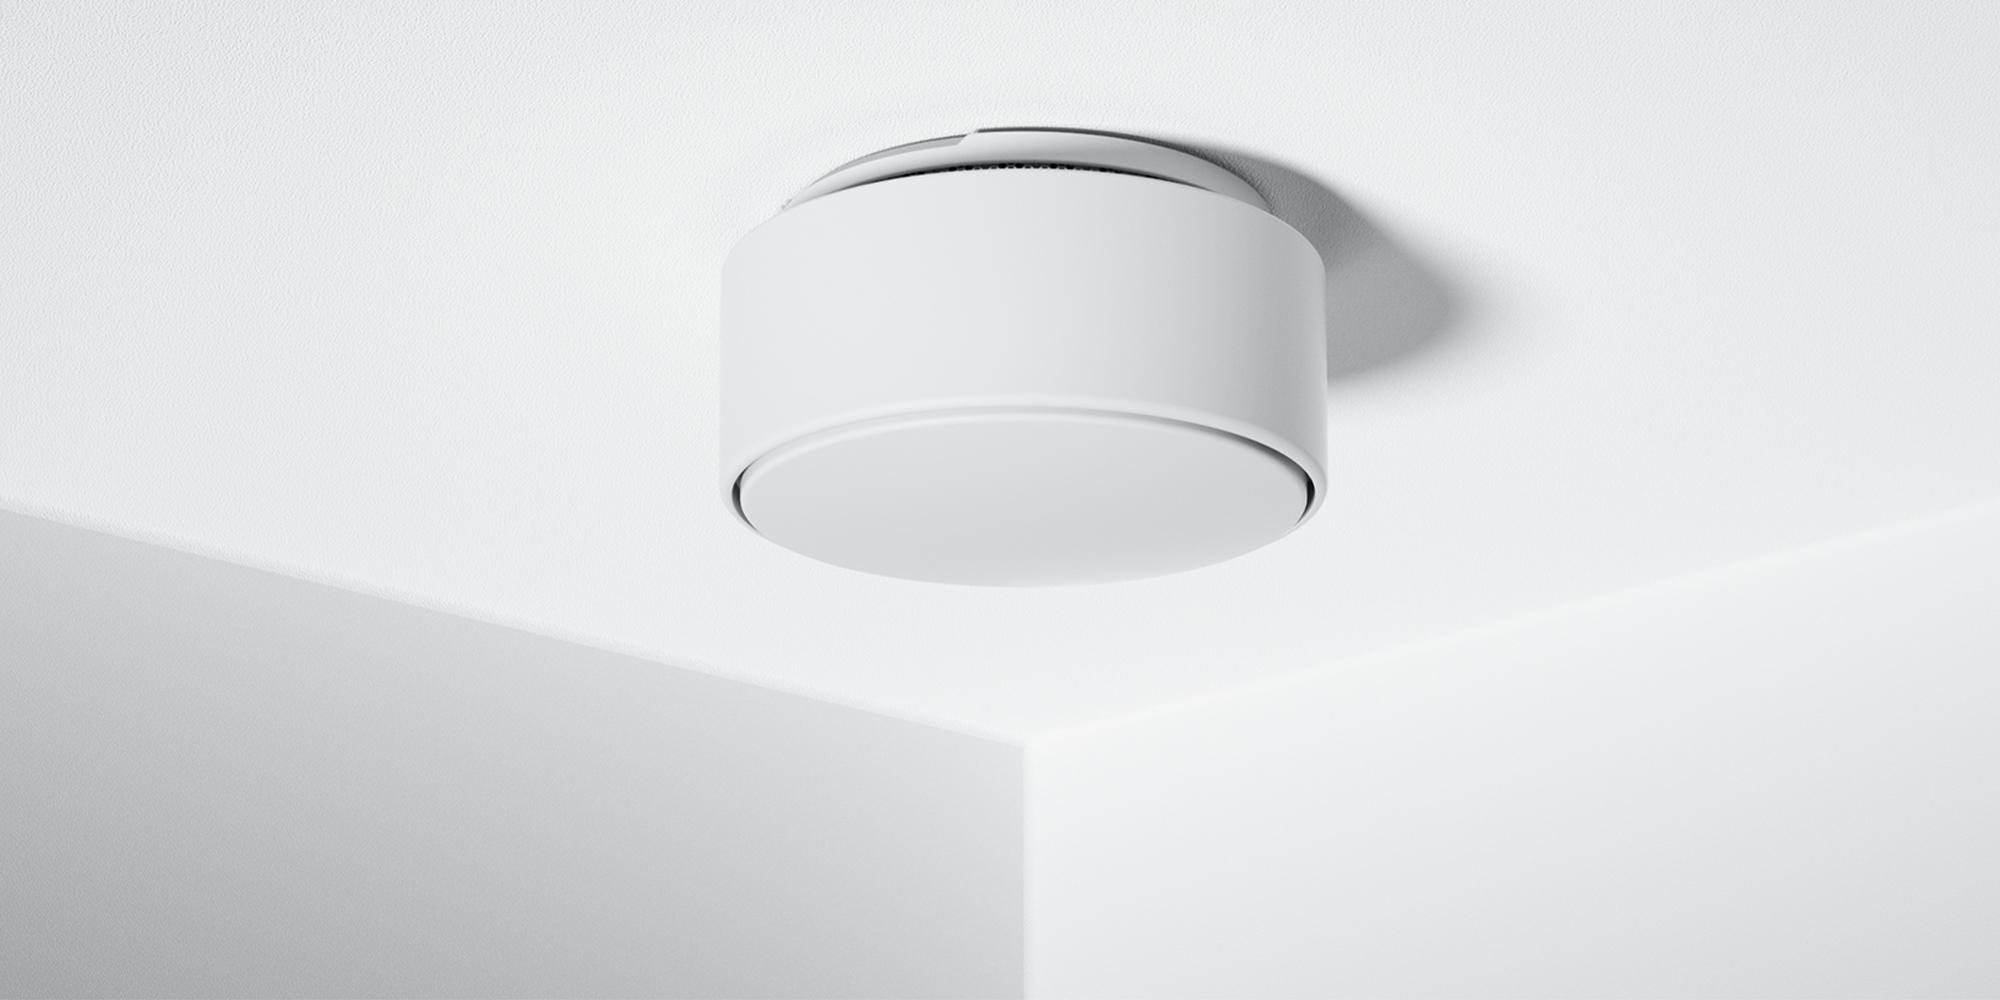 Minut home sensor installed on a white ceiling